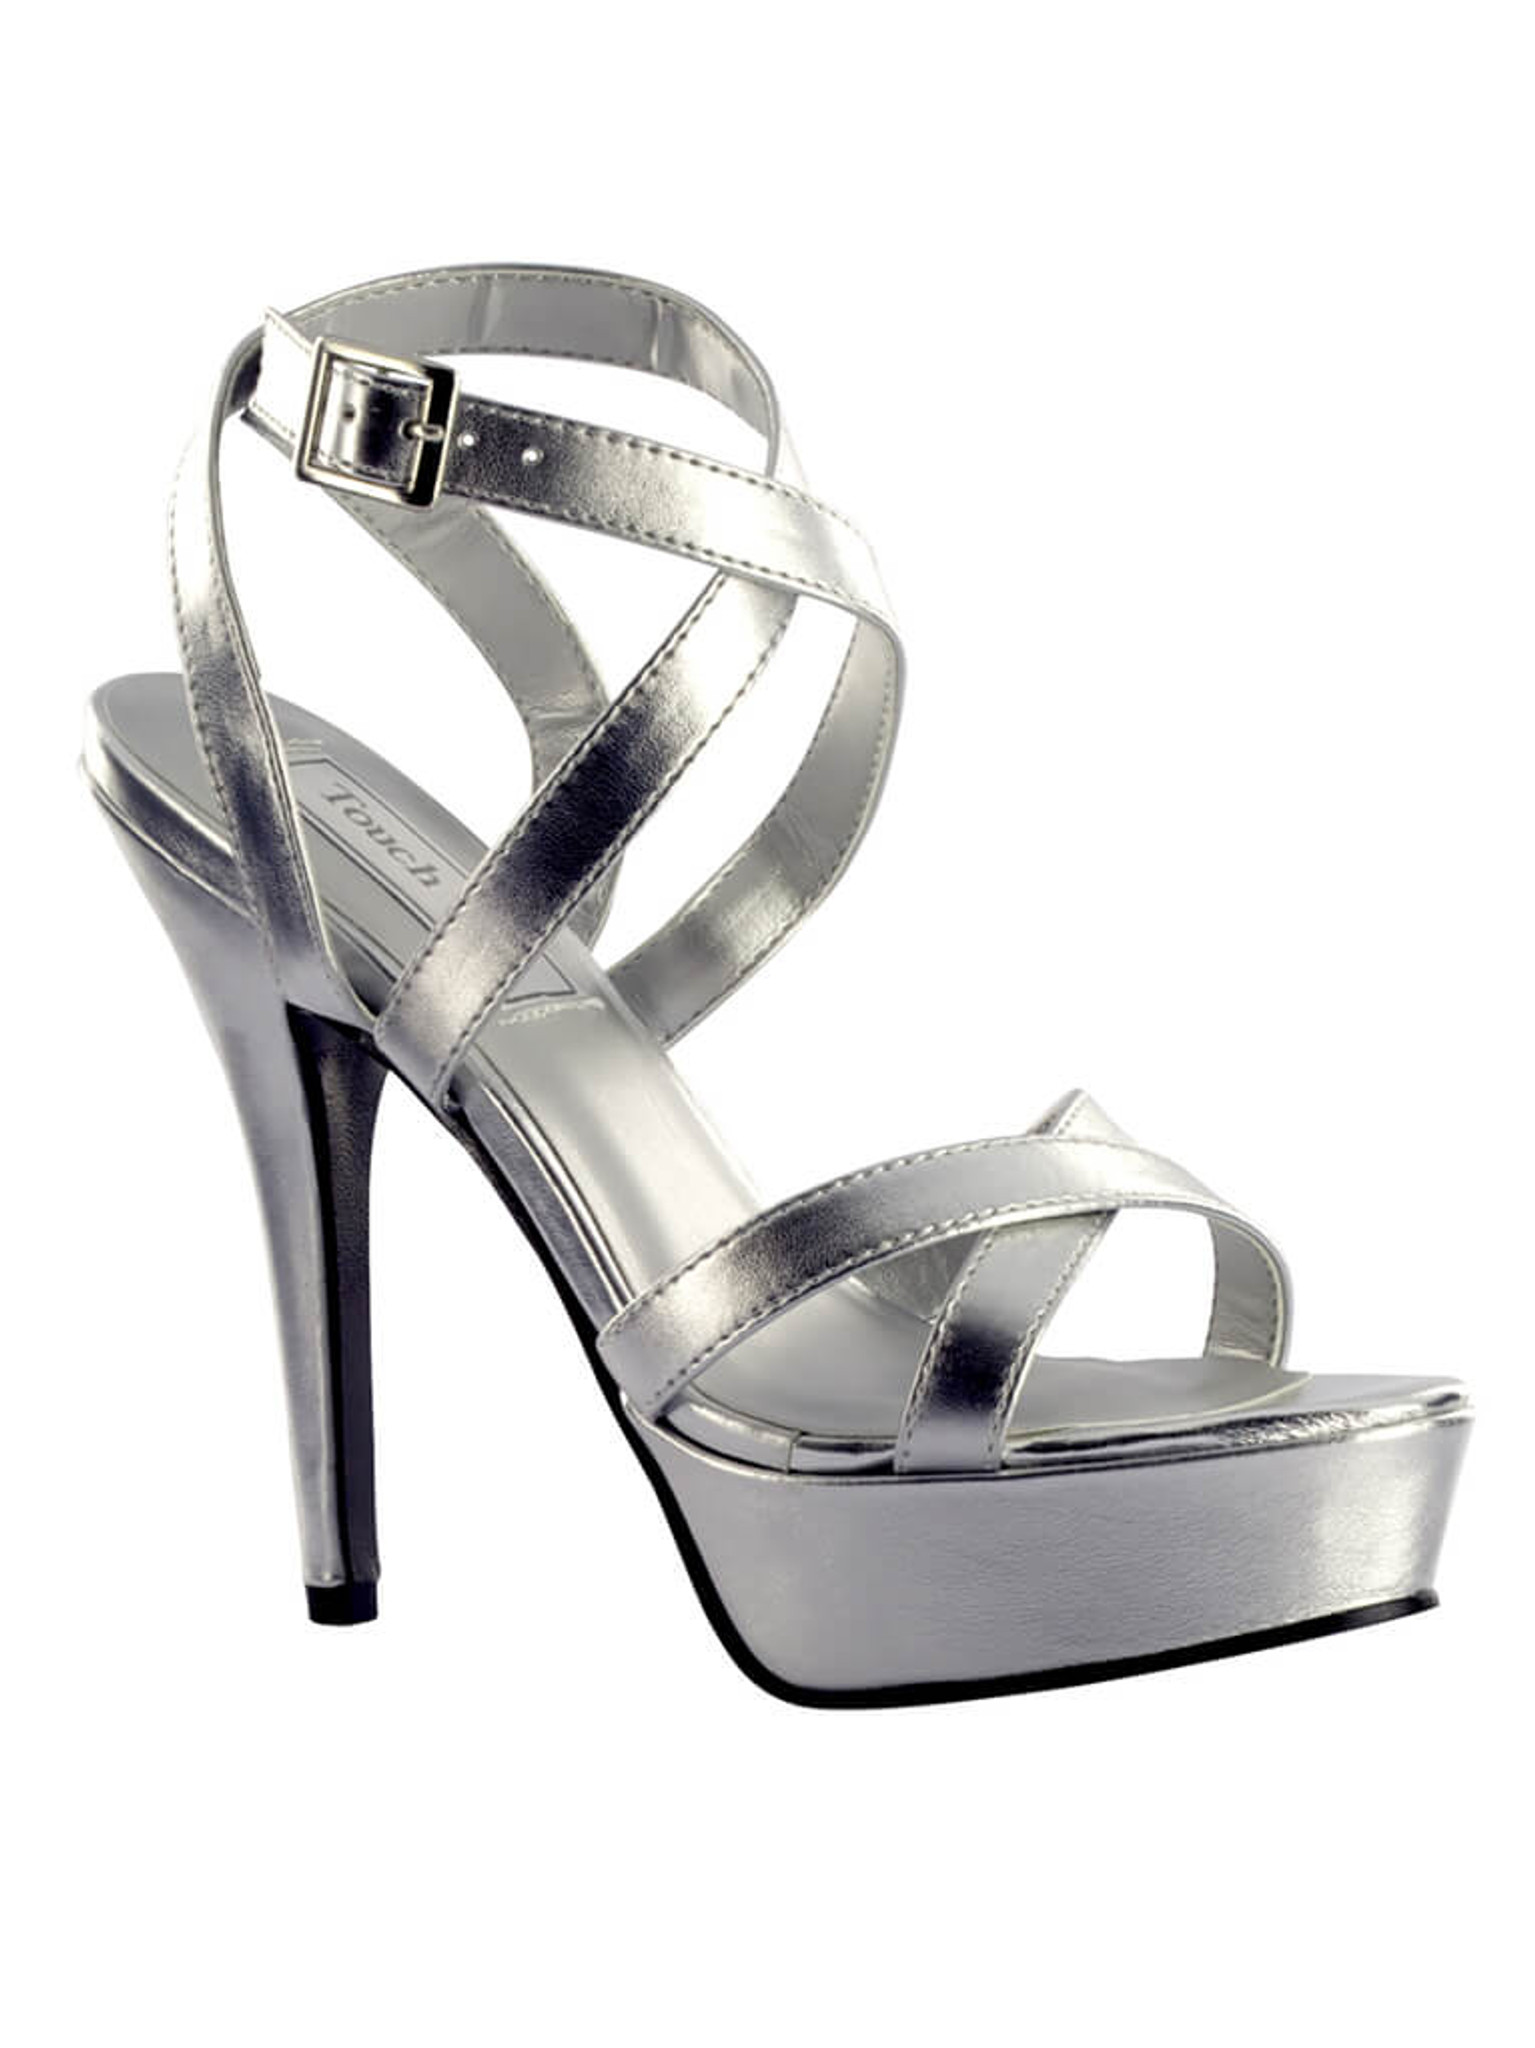 Touch Ups Pageant Shoes Platform Andrea 4117